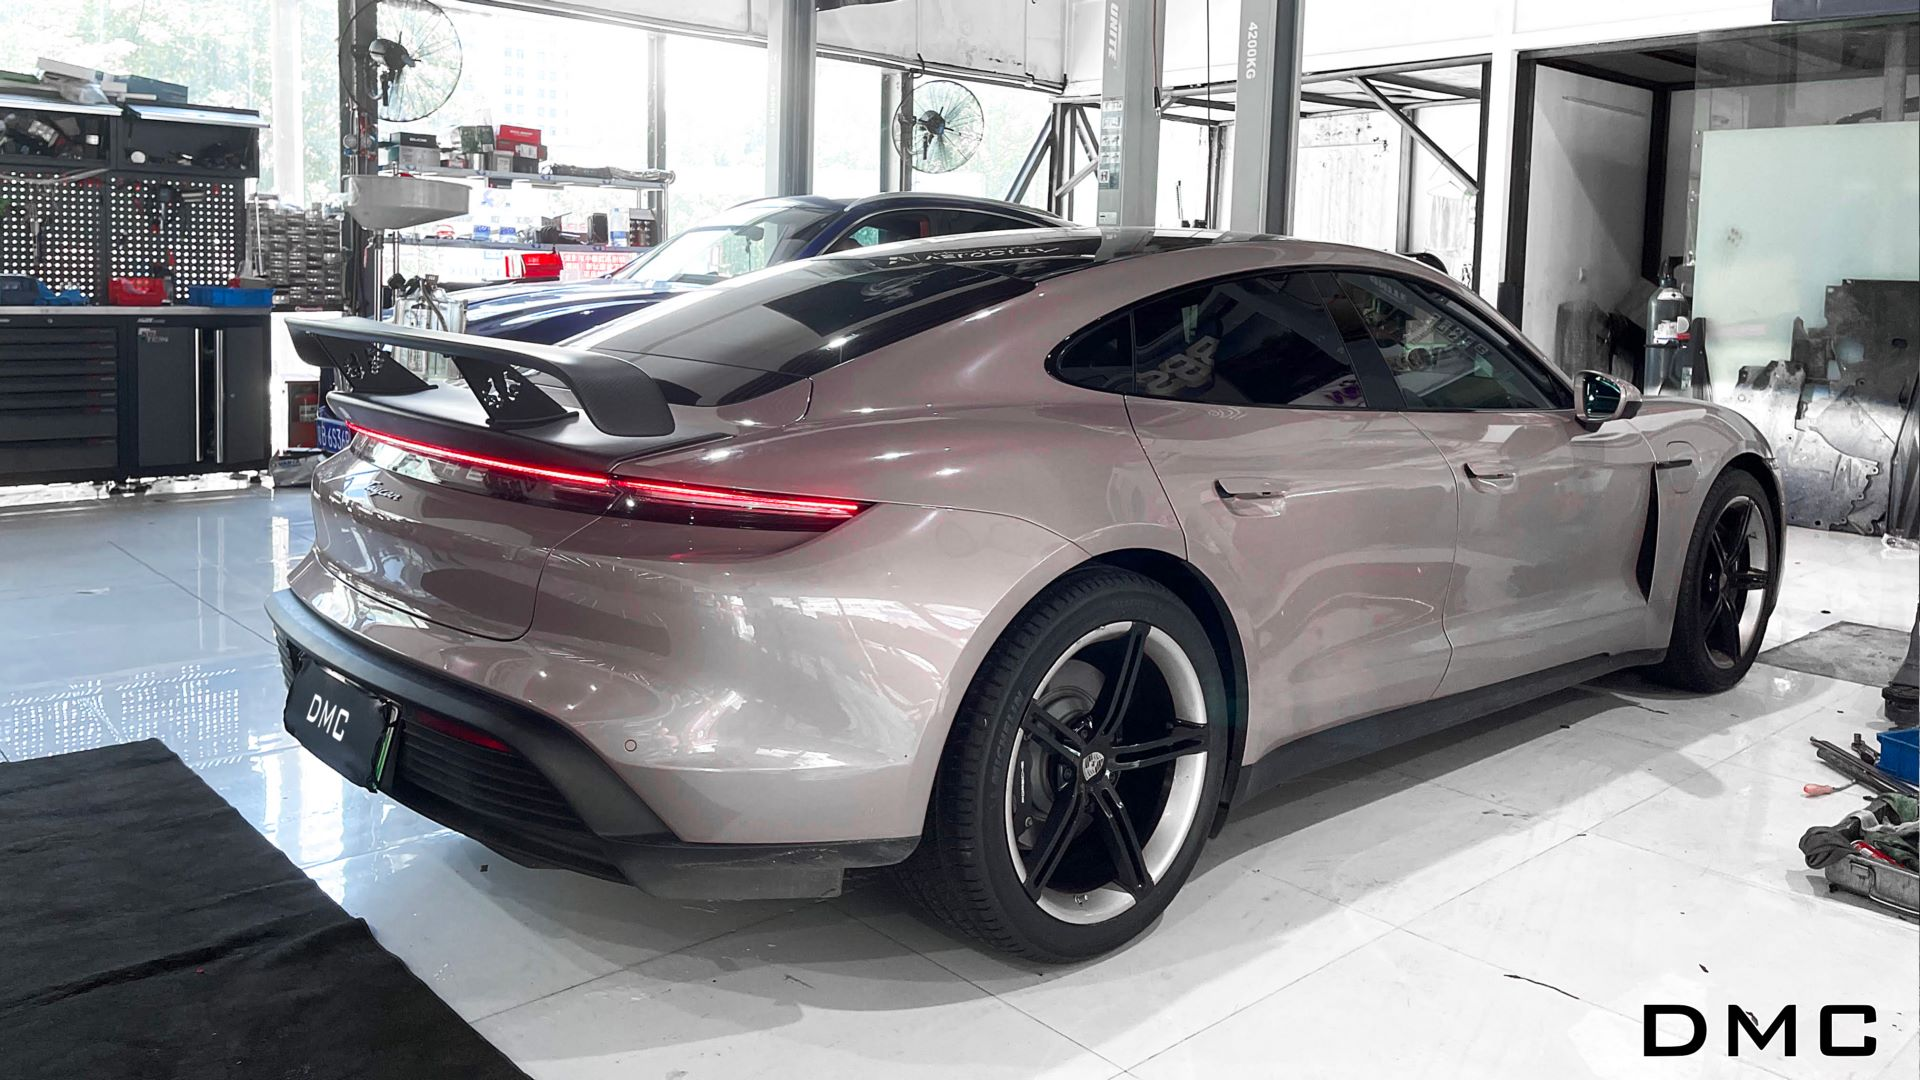 Porsche-Taycan-by-DMC-1